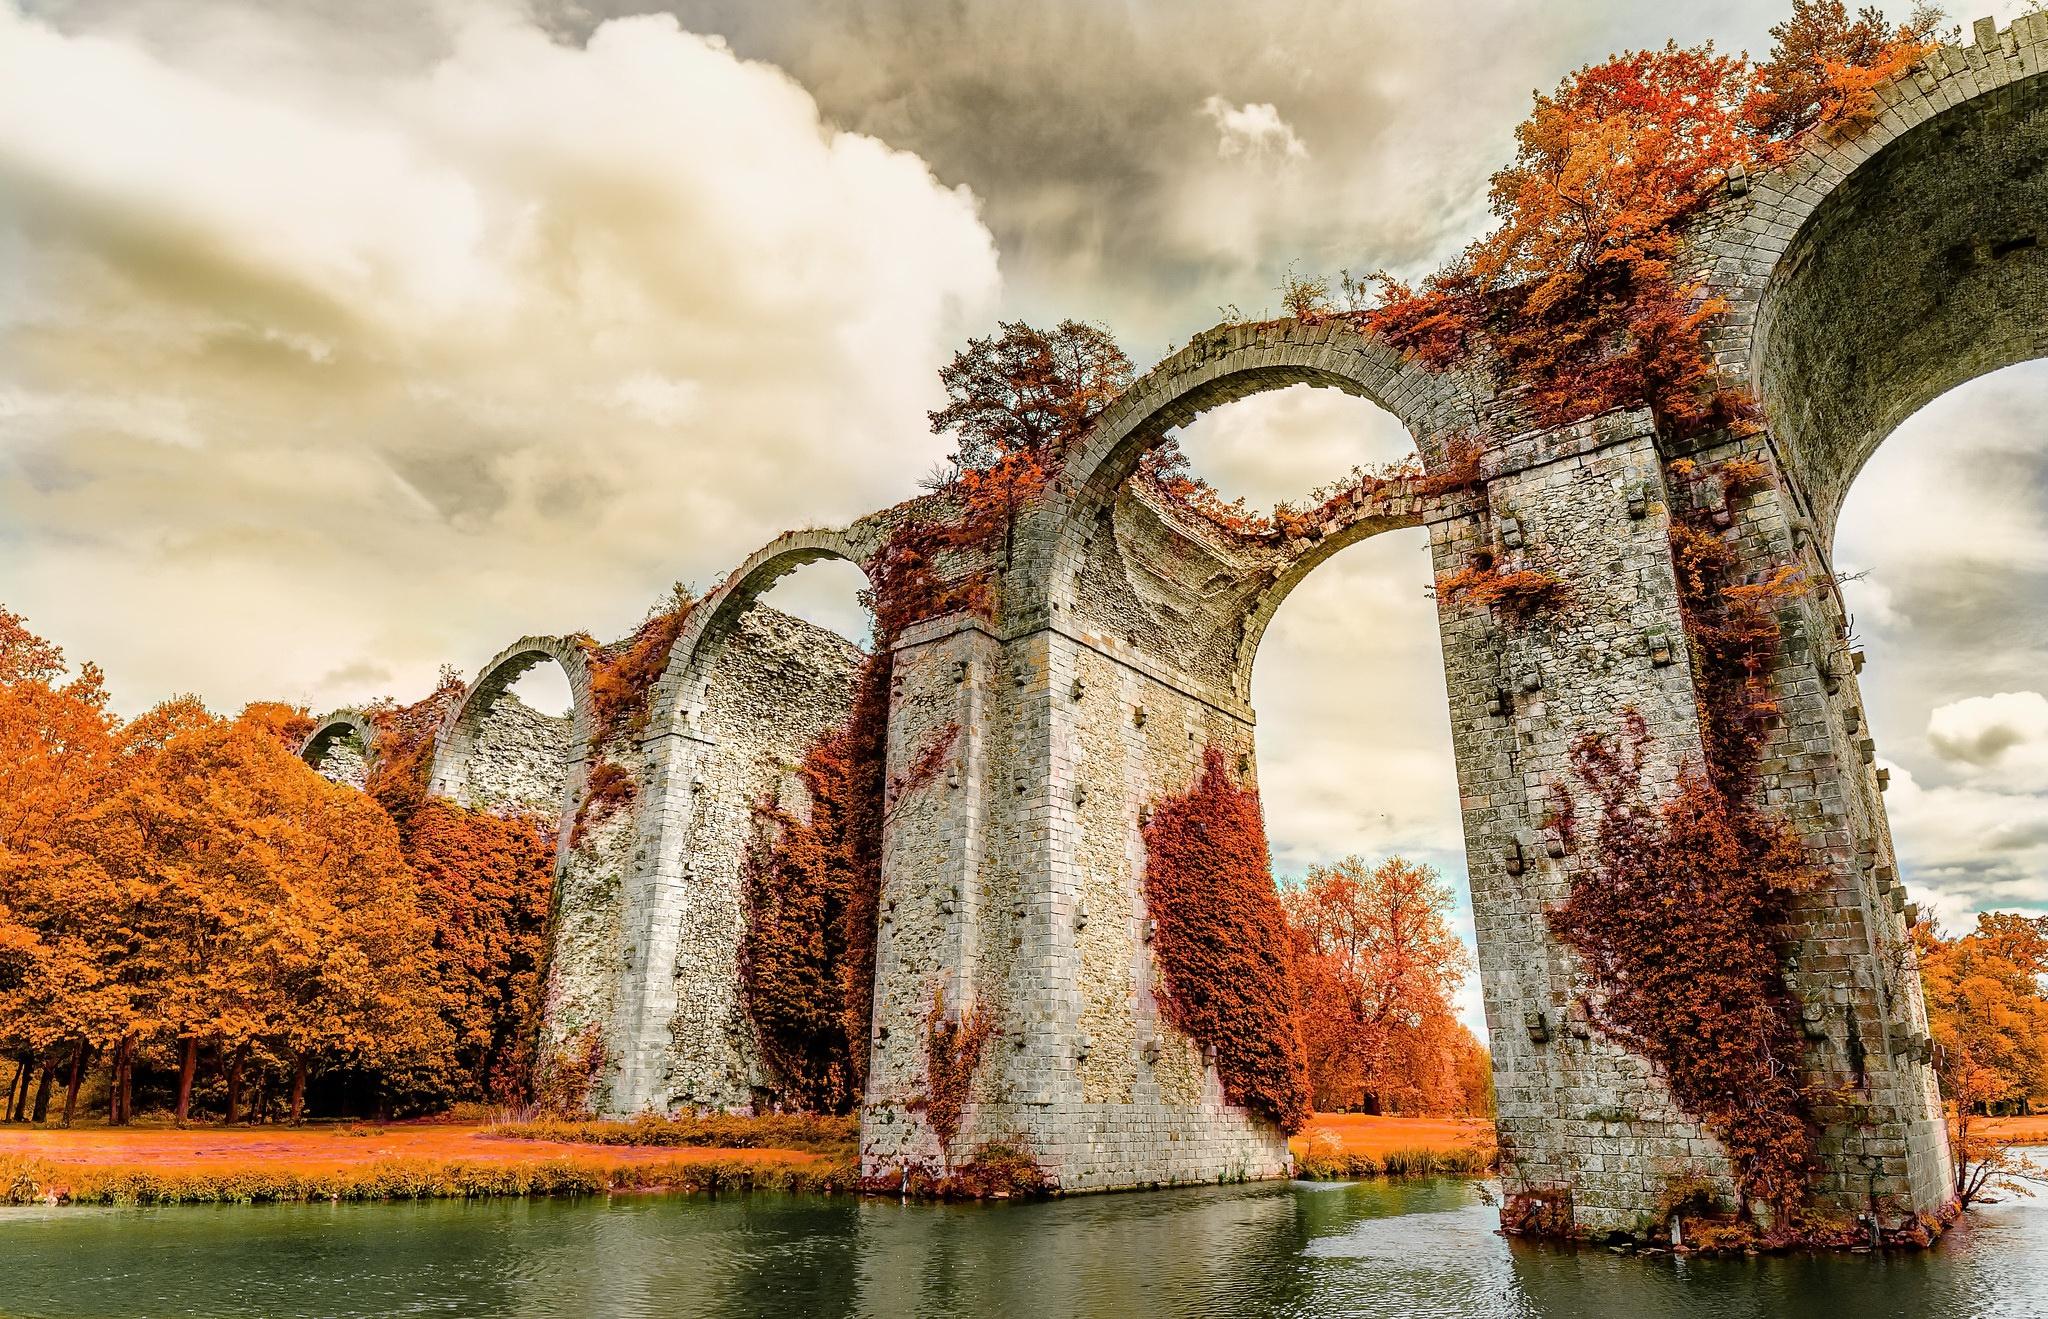 General 2048x1319 France Aqueduct Maintenon outdoors river fall